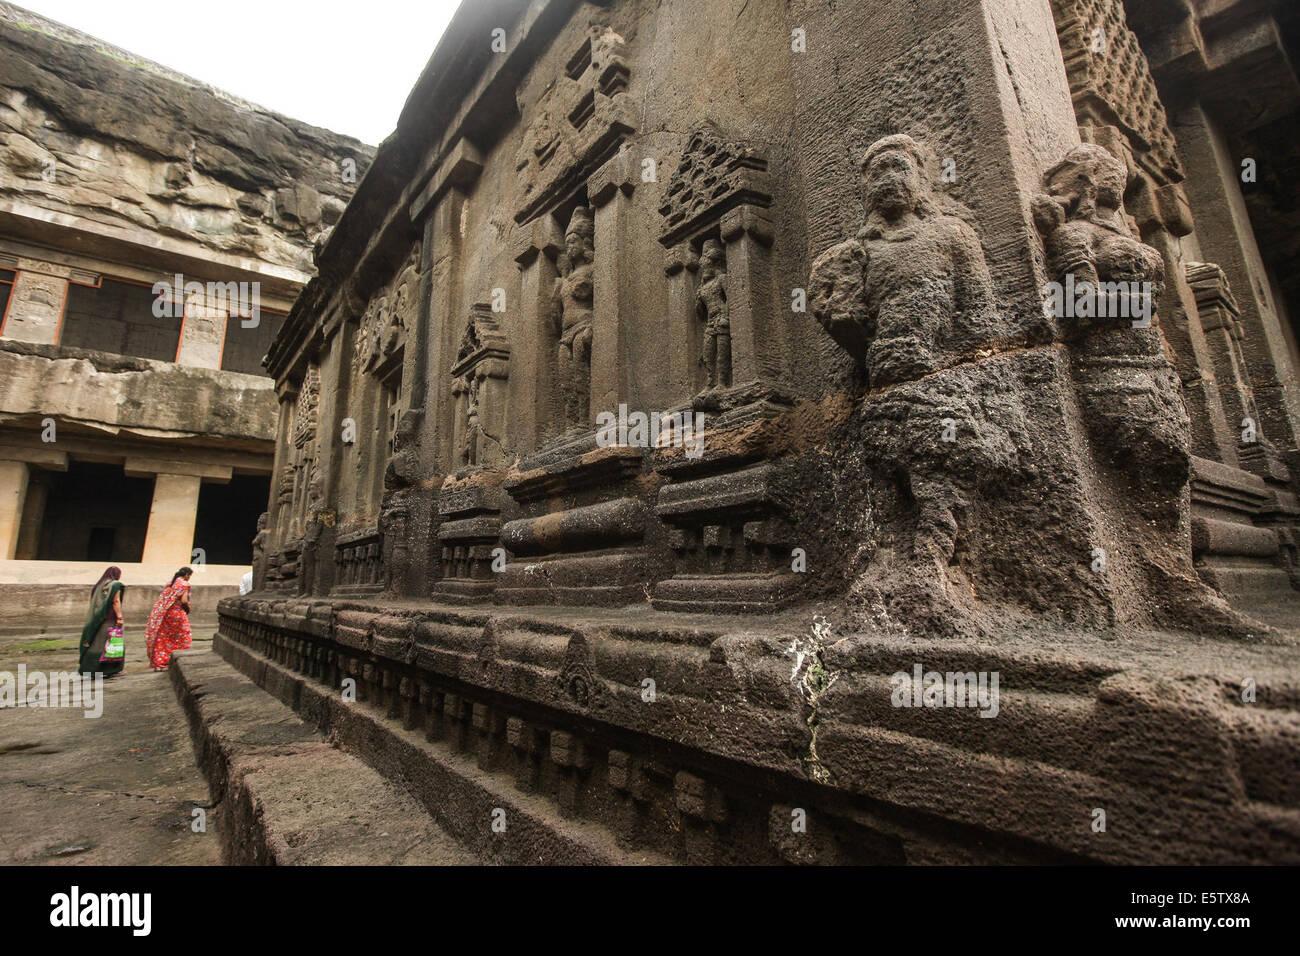 Maharashtra, India. 6th Aug, 2014. Tourists visit the ellora caves near Aurangabad in Maharashtra, India, Aug. 6, - Stock Image